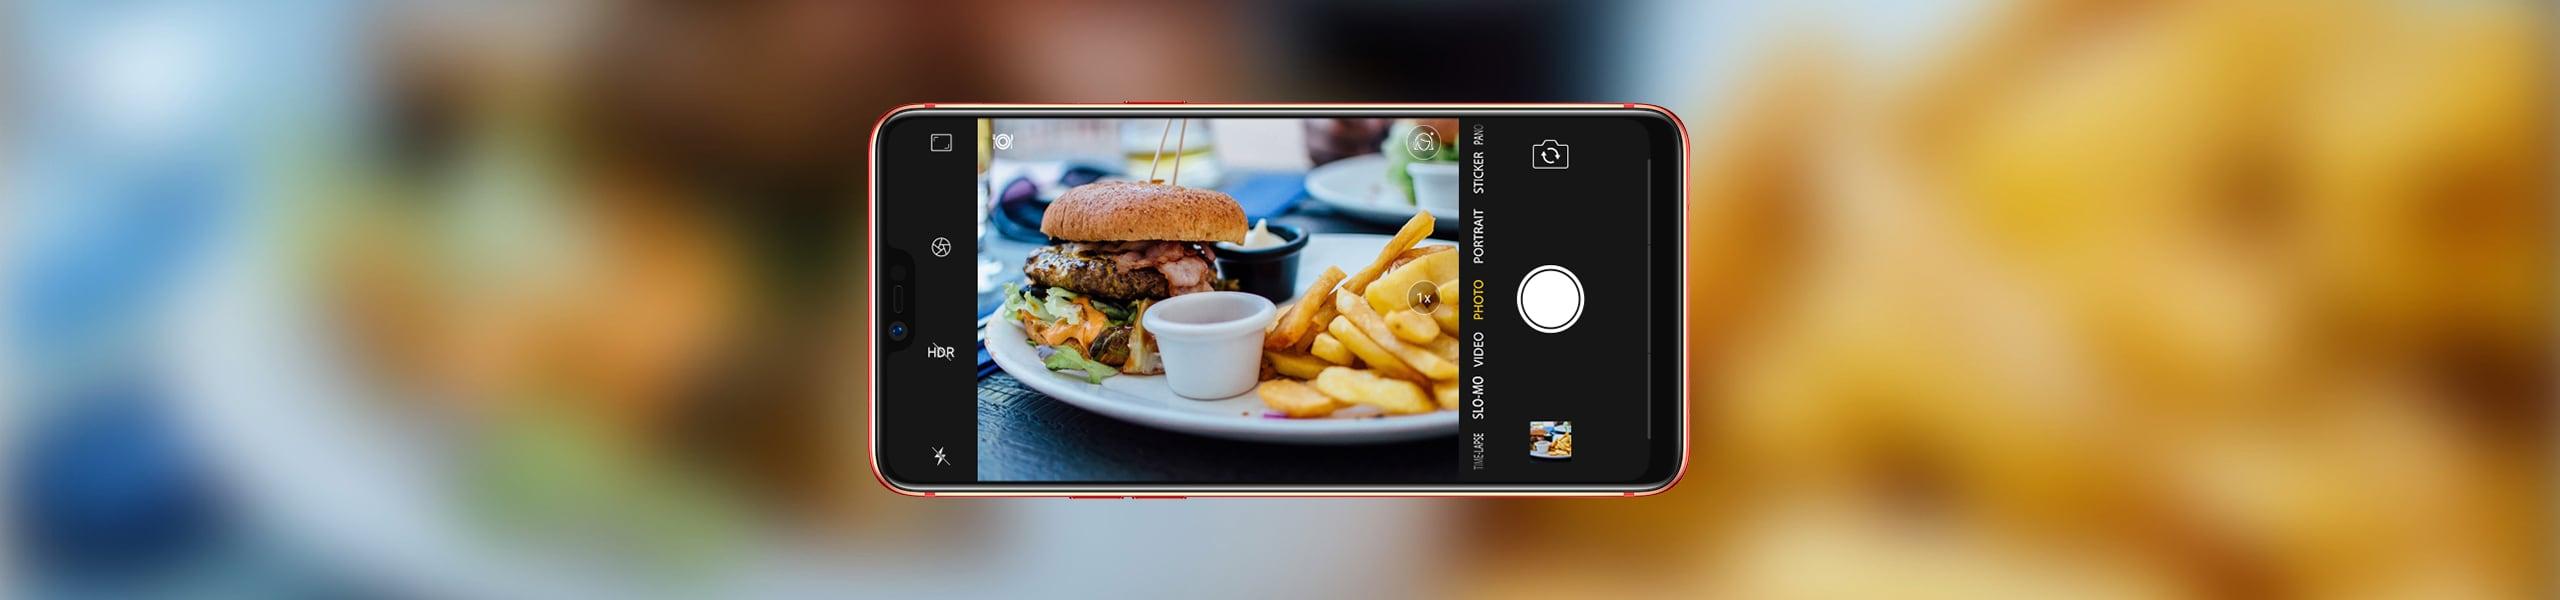 OPPO R15 Pro - AI Enhanced Camera Phone - OPPO Global